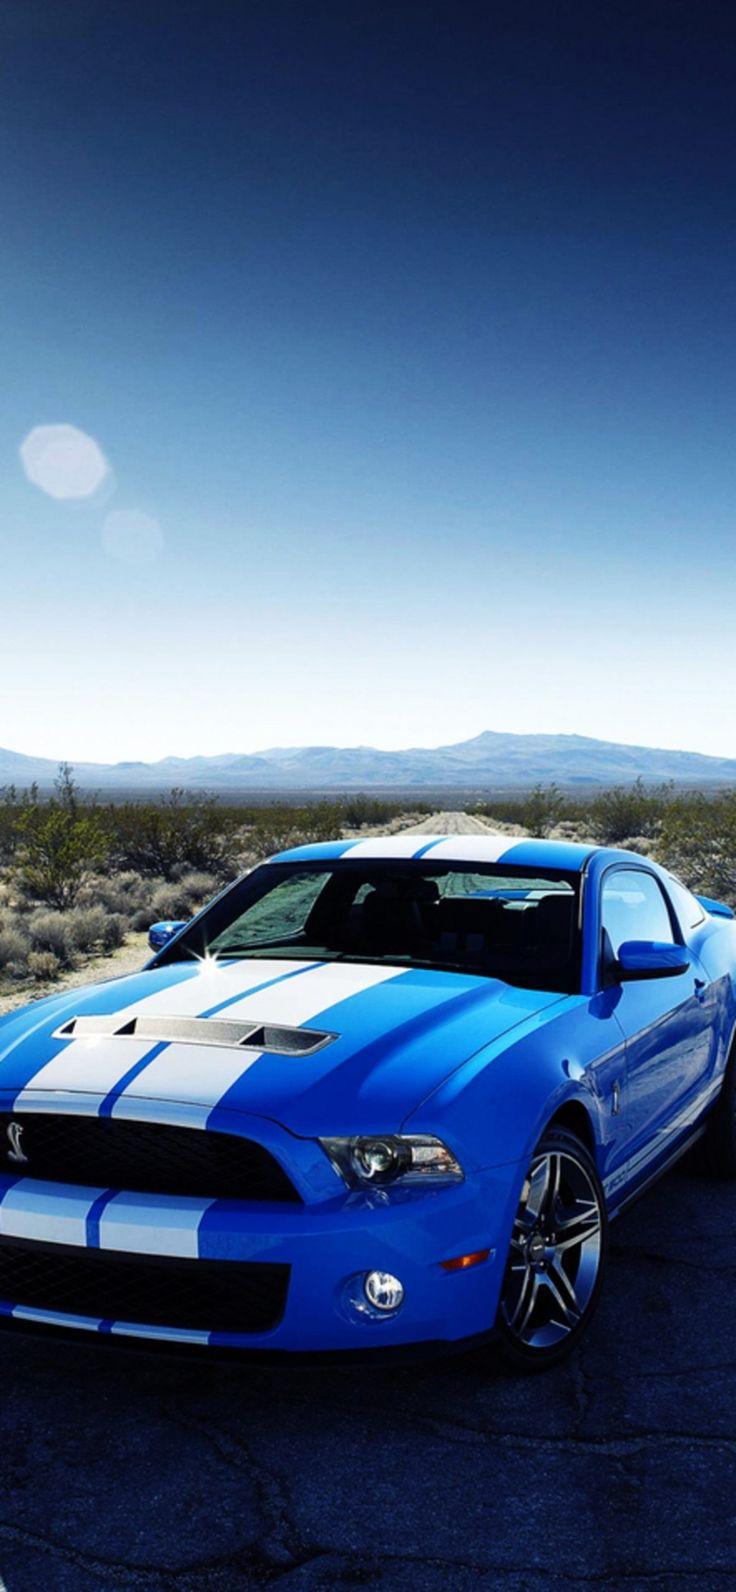 Fast And Furious Hd Wallpapers 1242x2688 Car Wallpapers Car Iphone Wallpaper Mustang Wallpaper